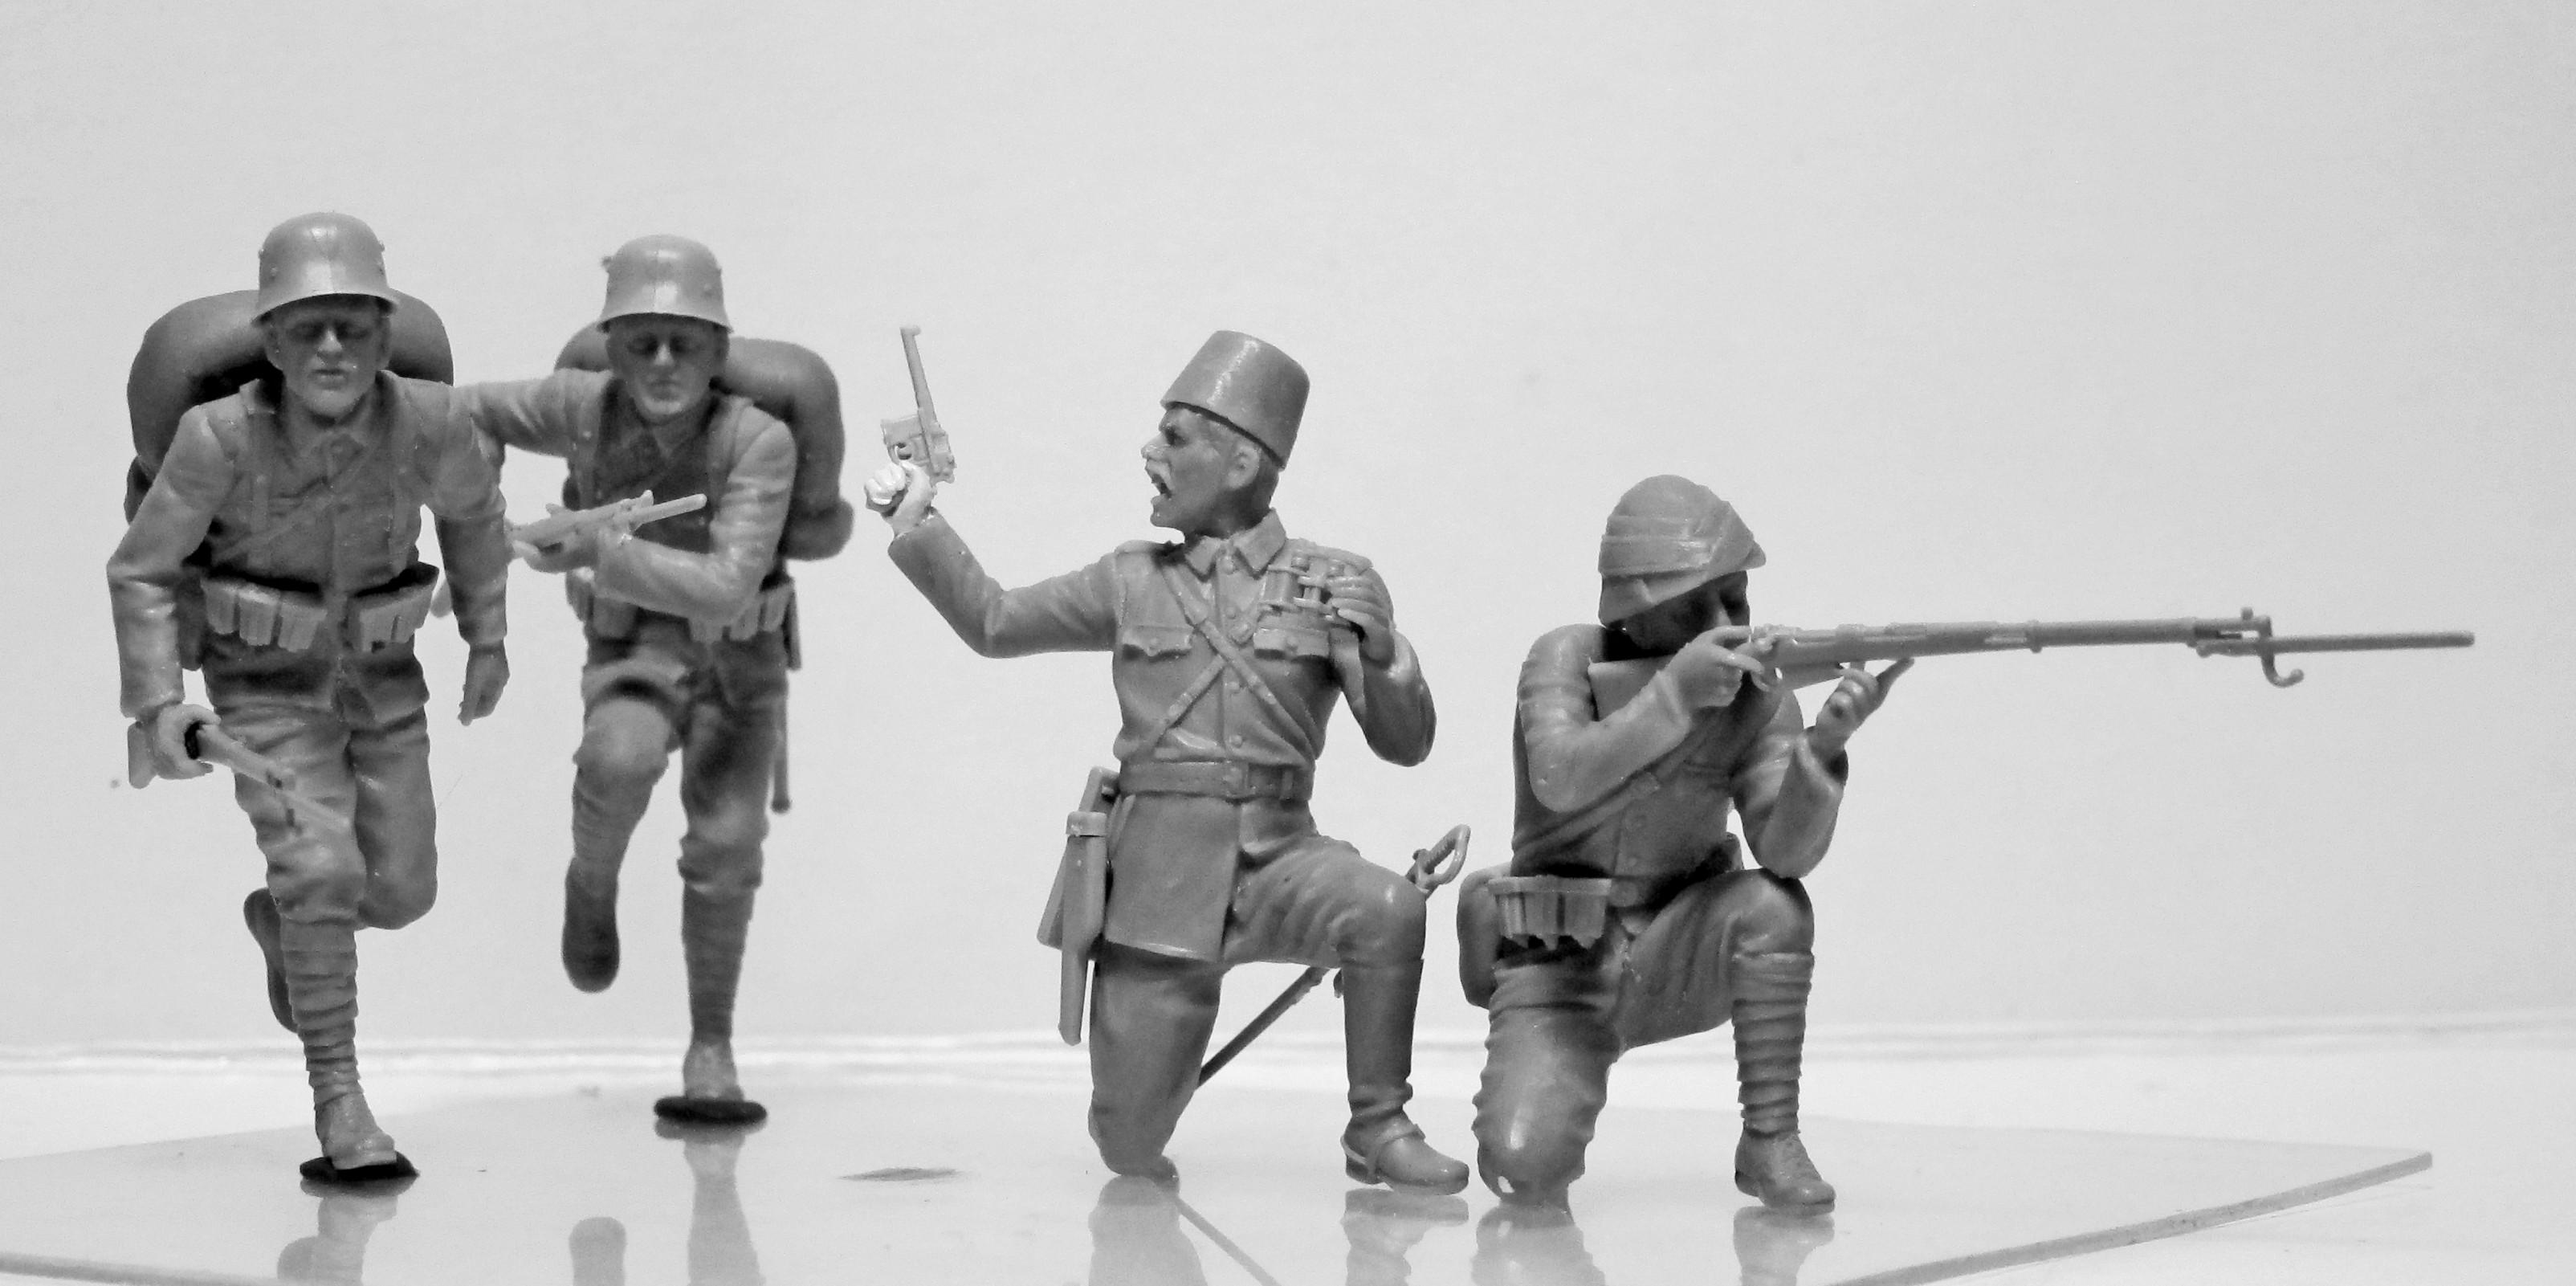 1/35 Gallipoli (1915) DS3501